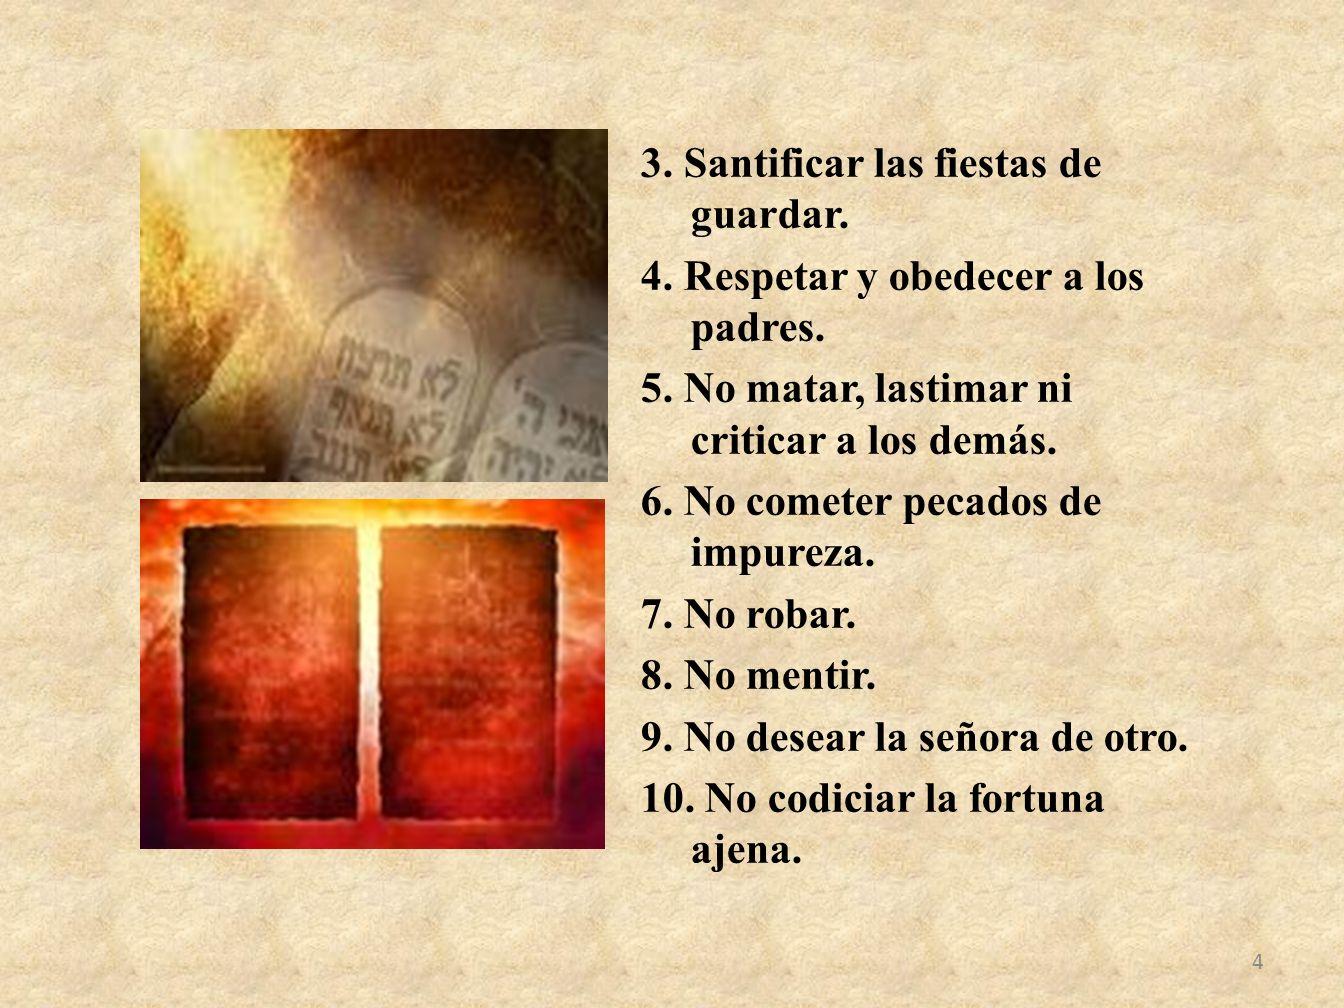 3. Santificar las fiestas de guardar. 4